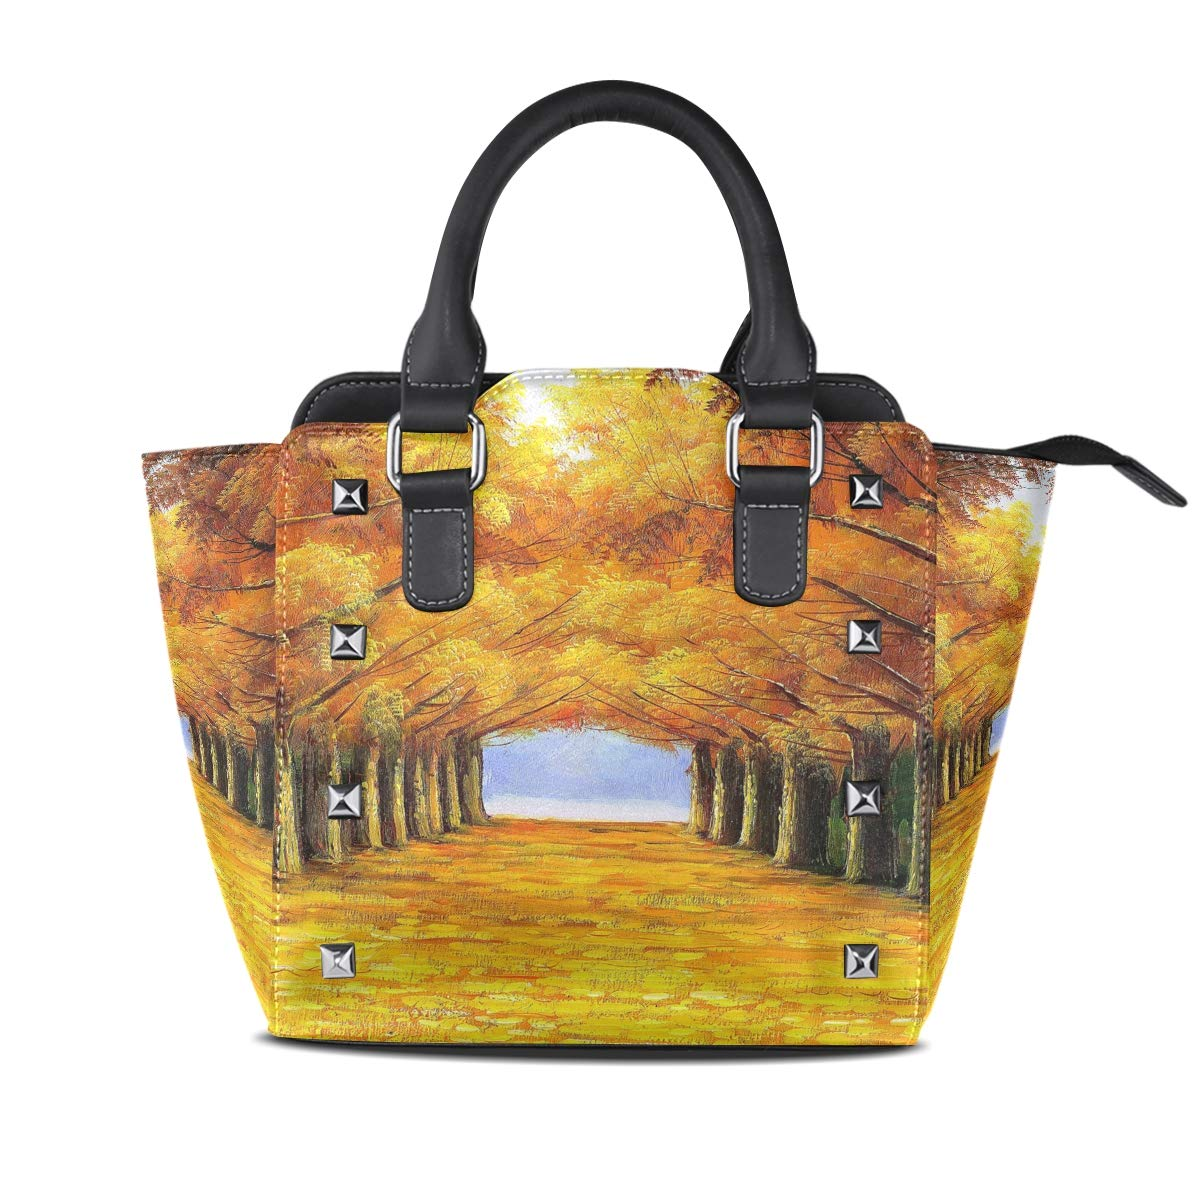 Design1 Autumn Street Top Handle Satchel Handbags Leather Tote Adjustable Shoulder Rivet Bag for Women